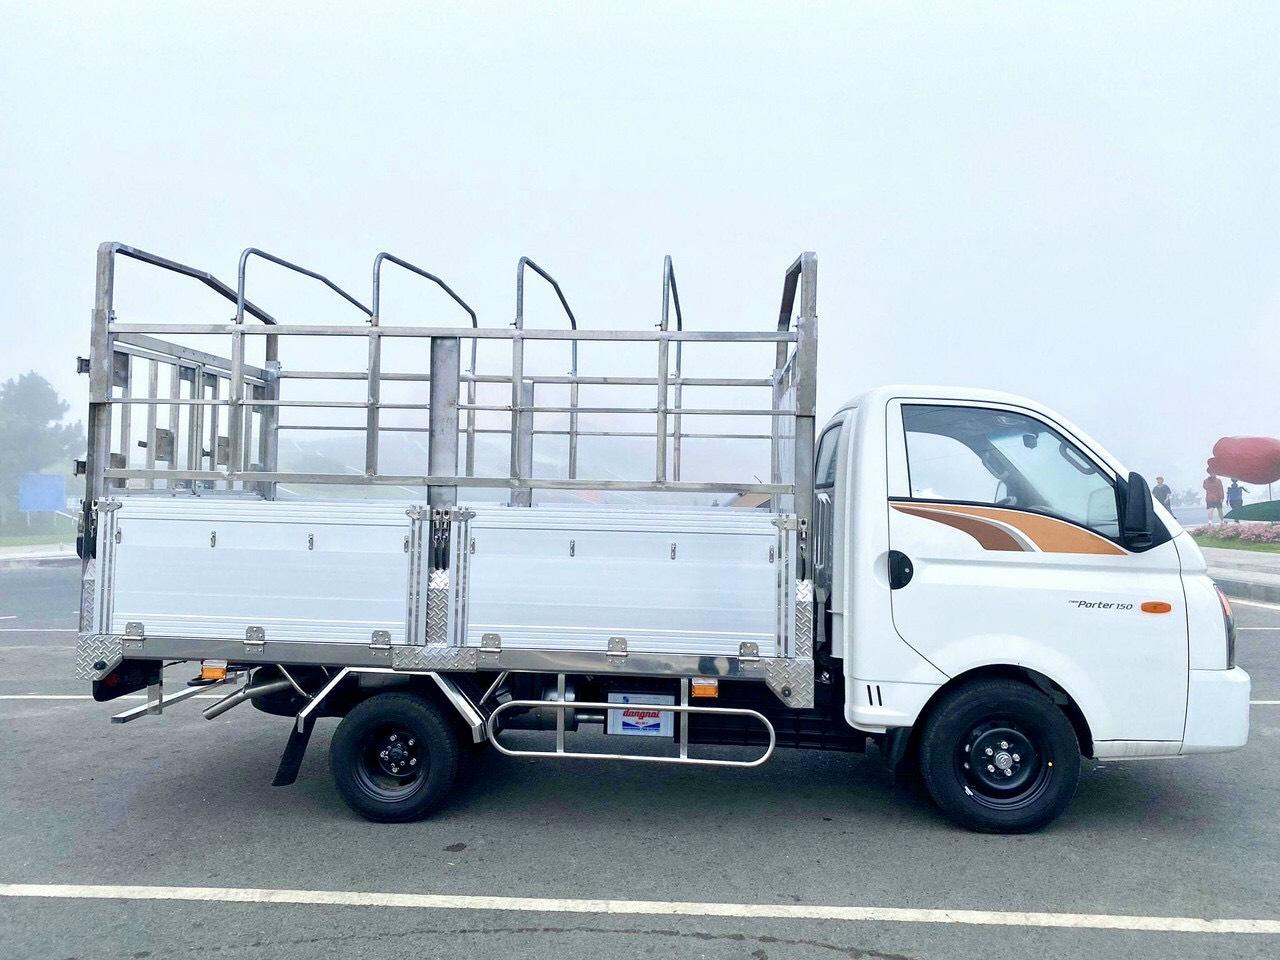 Bán xe tải Hyundai H150 tại Lai Châu